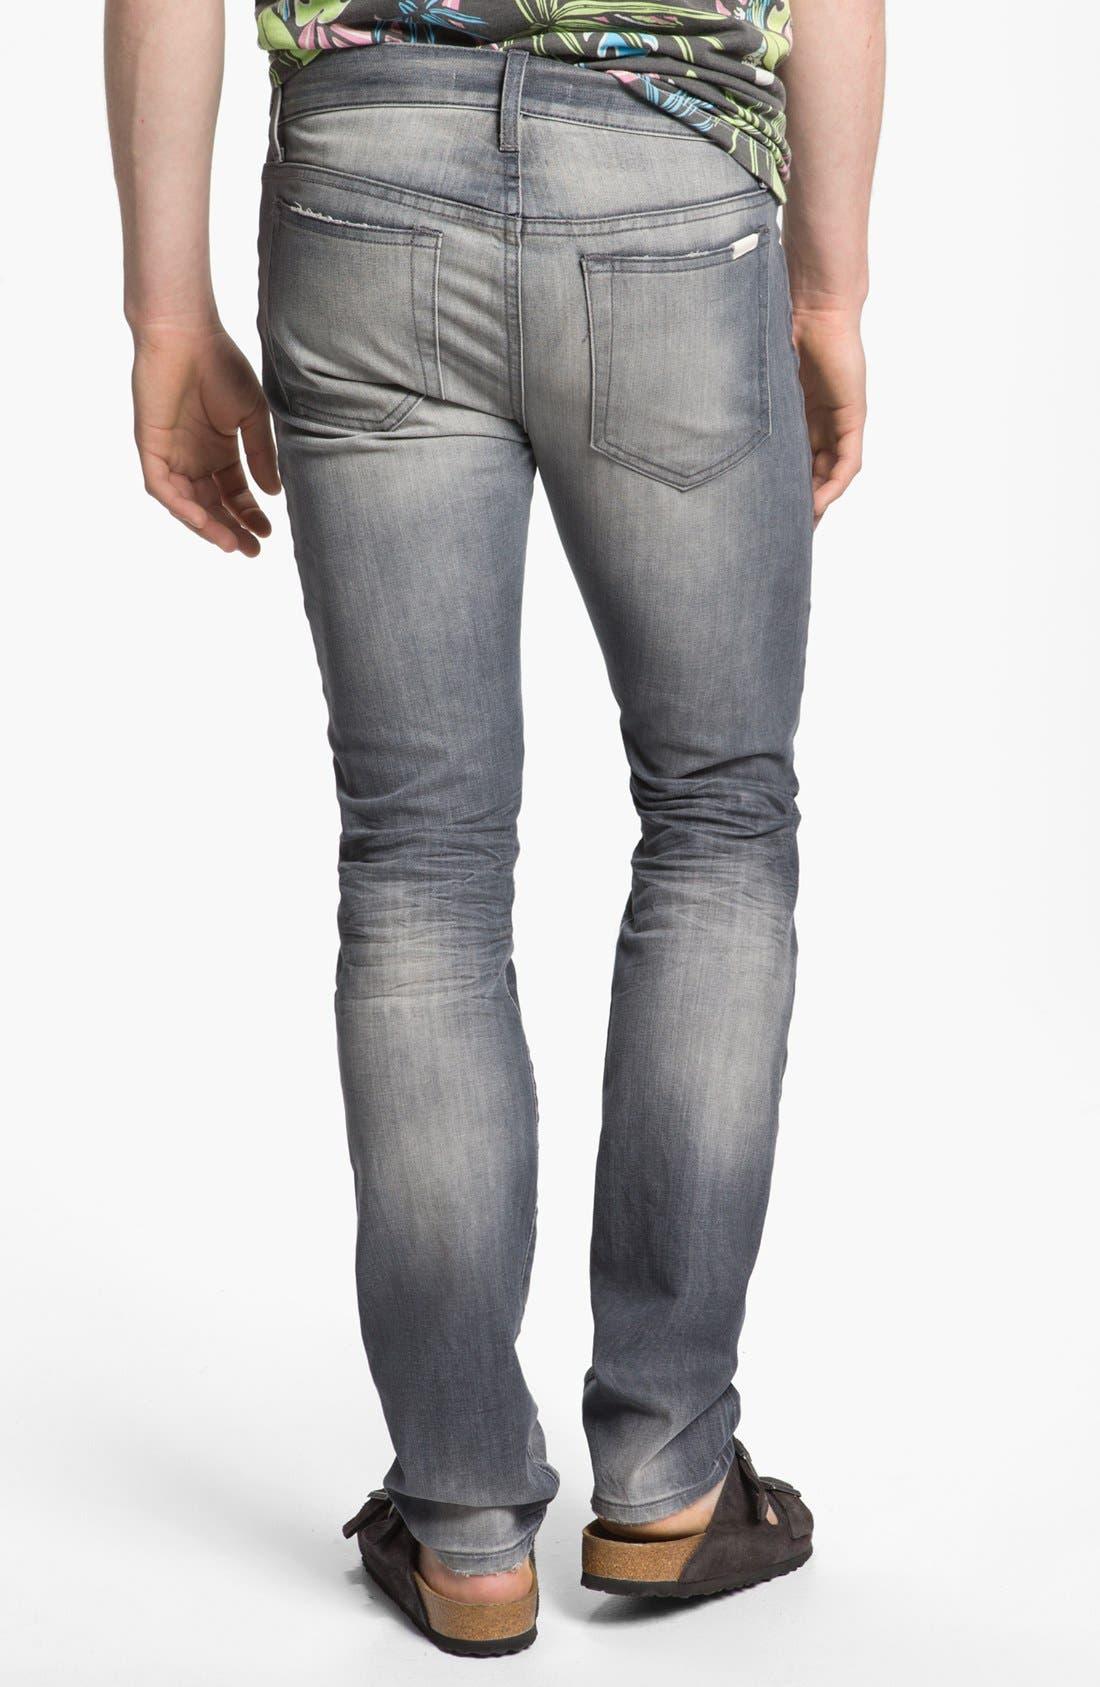 Alternate Image 1 Selected - Joe's 'Slim' Skinny Fit Selvedge Jeans (Briggs)